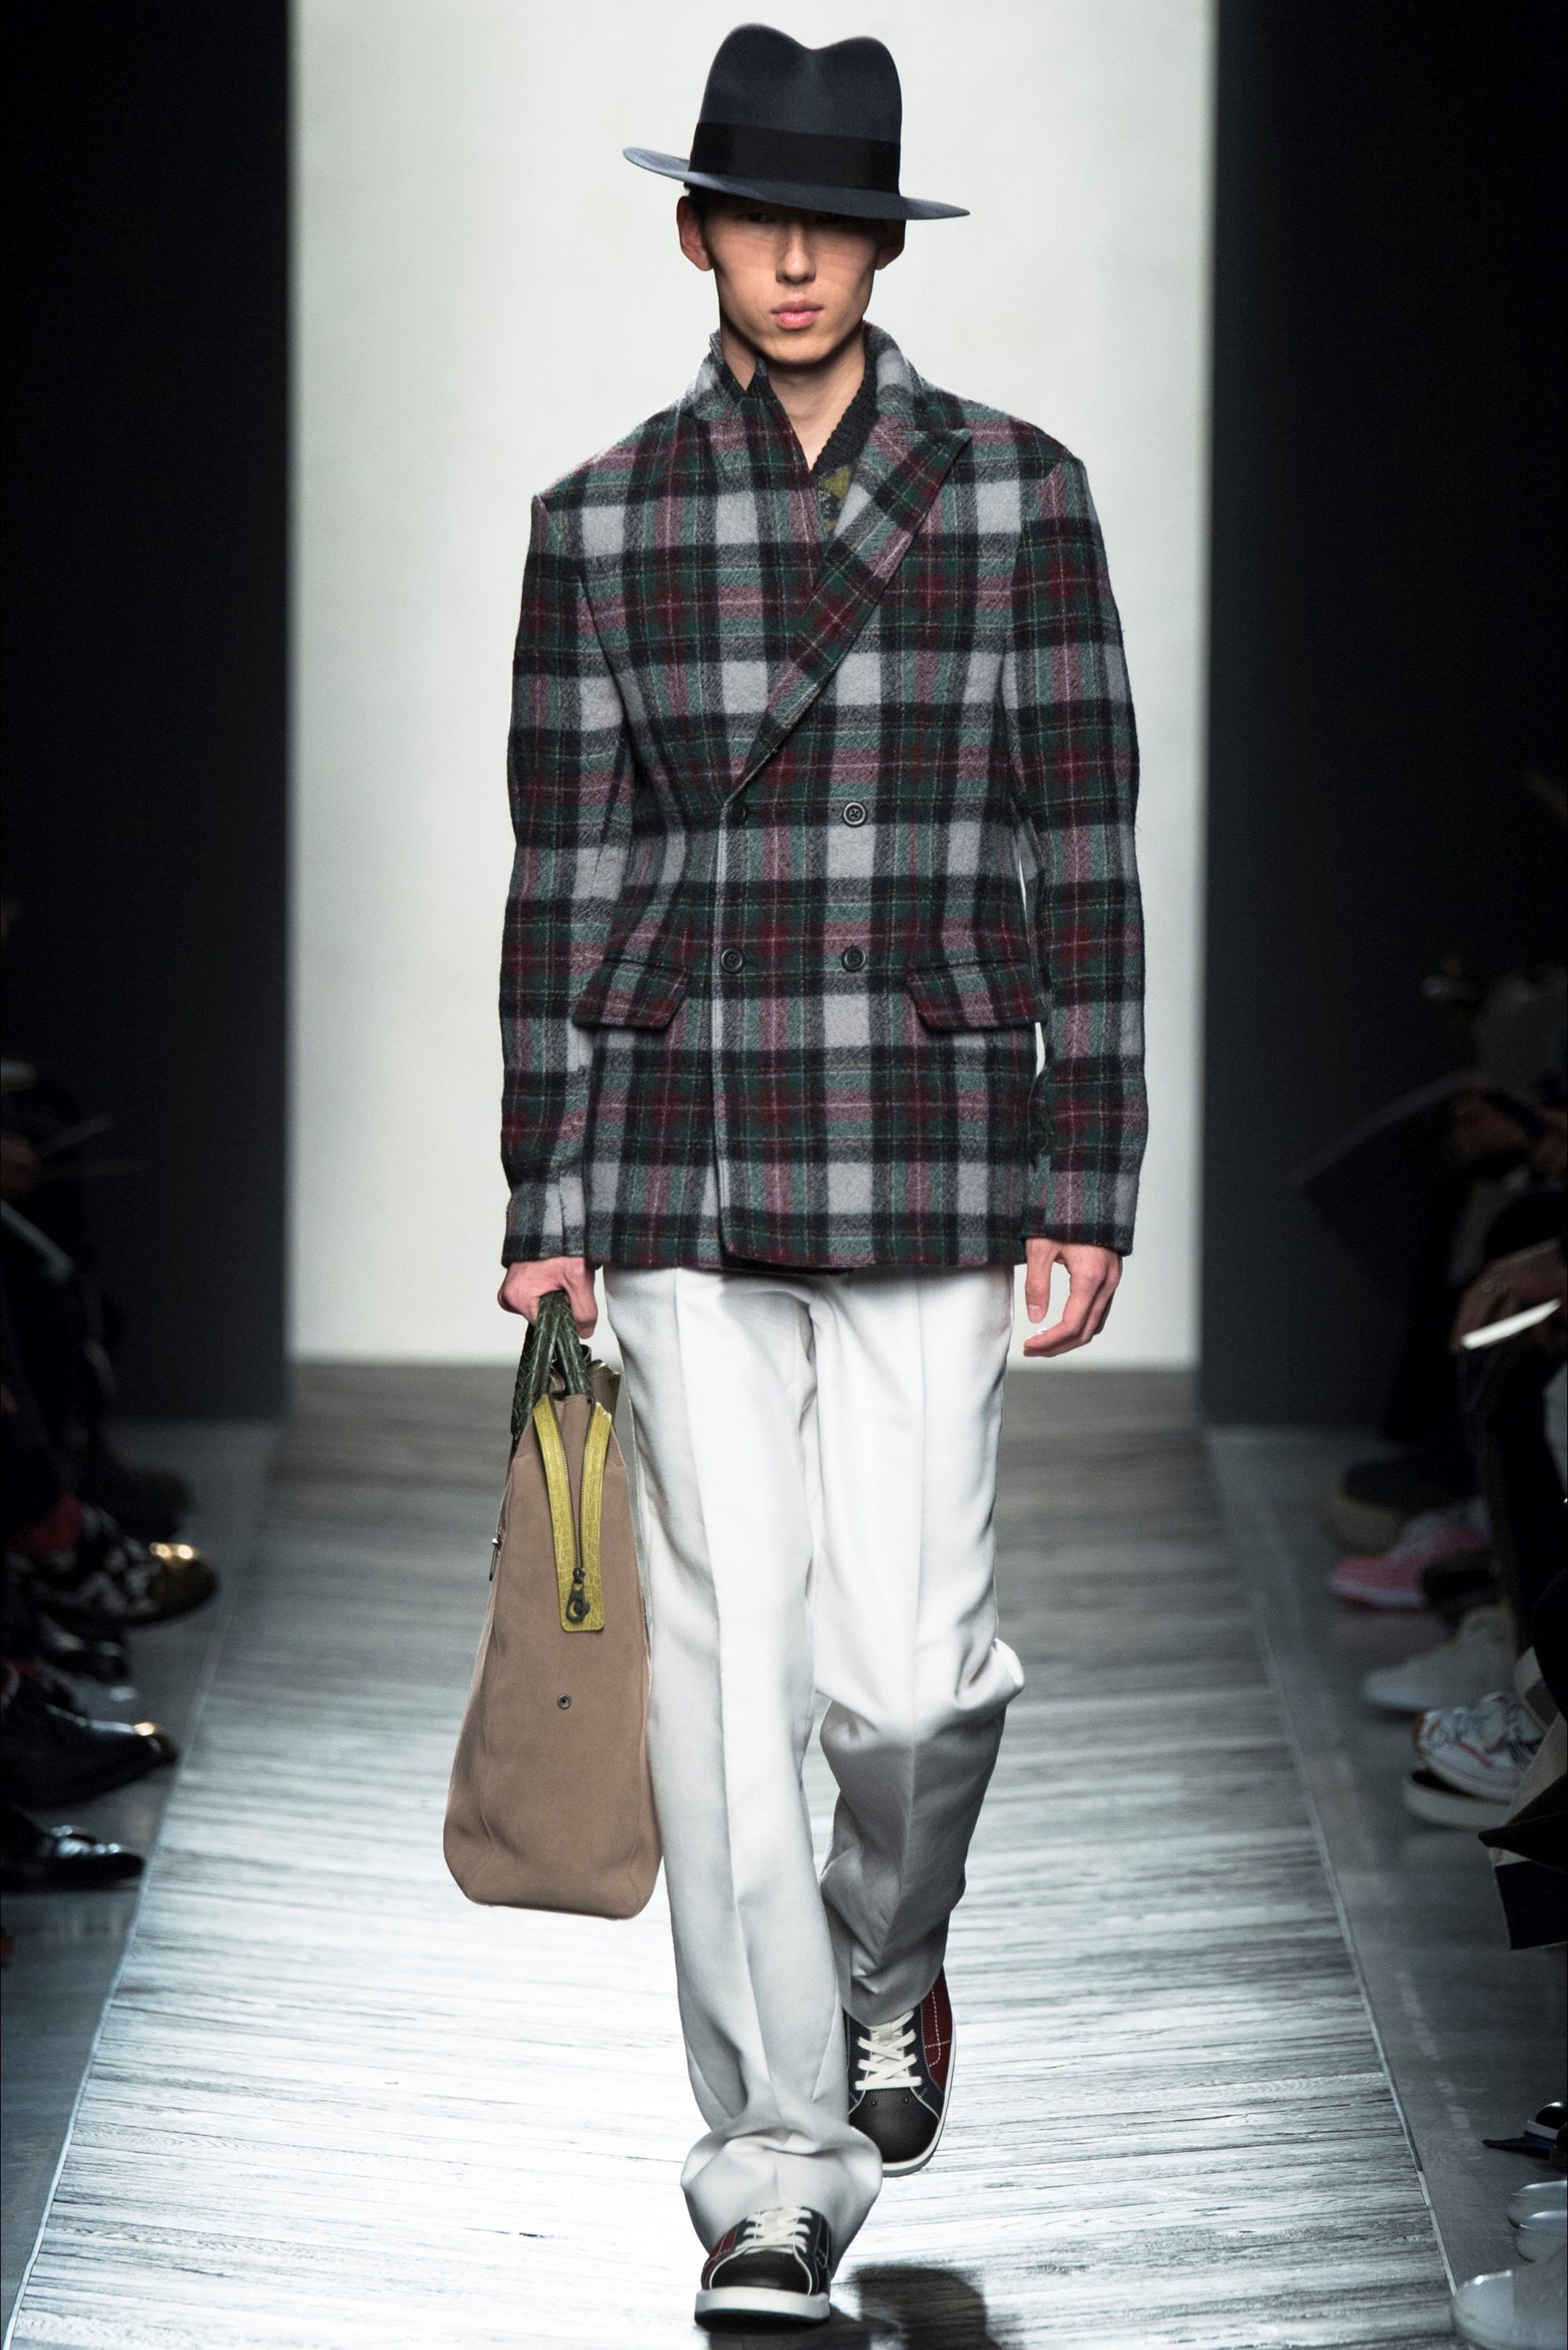 Sfilata Moda Uomo Bottega Veneta Milano - Autunno Inverno 2016-17 - Vogue 8fd524aa5bc